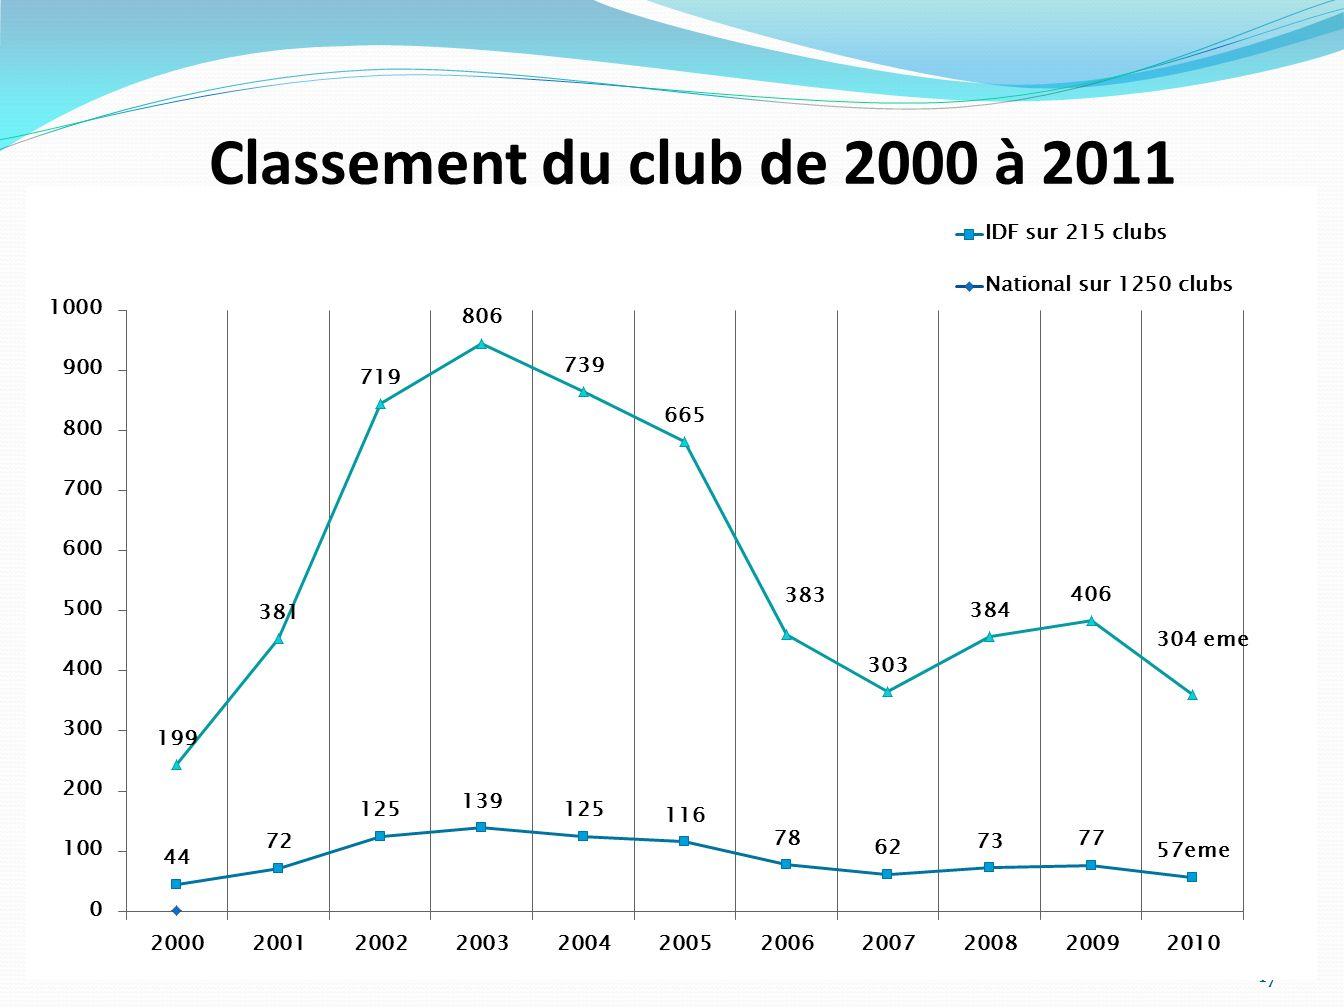 Classement du club de 2000 à 2011 ASN L.R.S. - Dossier de partenariat 2006/2007 - asnlrs@yahoo.fr